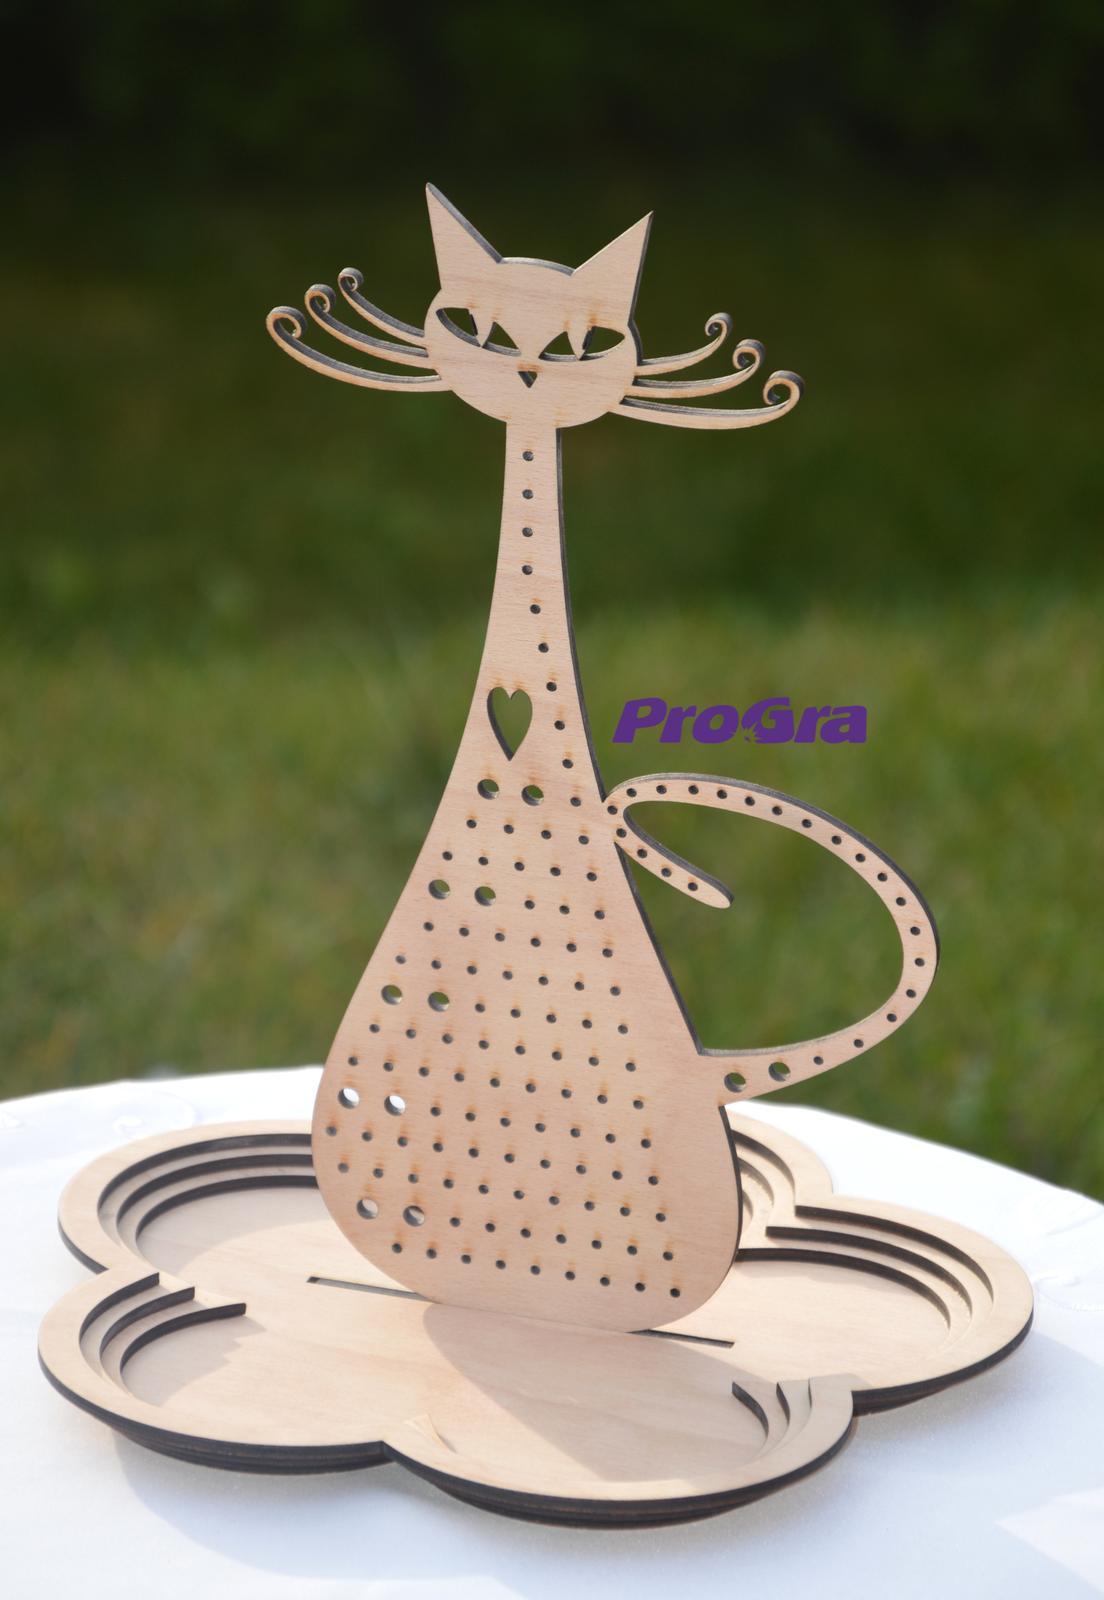 Po svatbě - Mica - parádnica - stojan na šperky